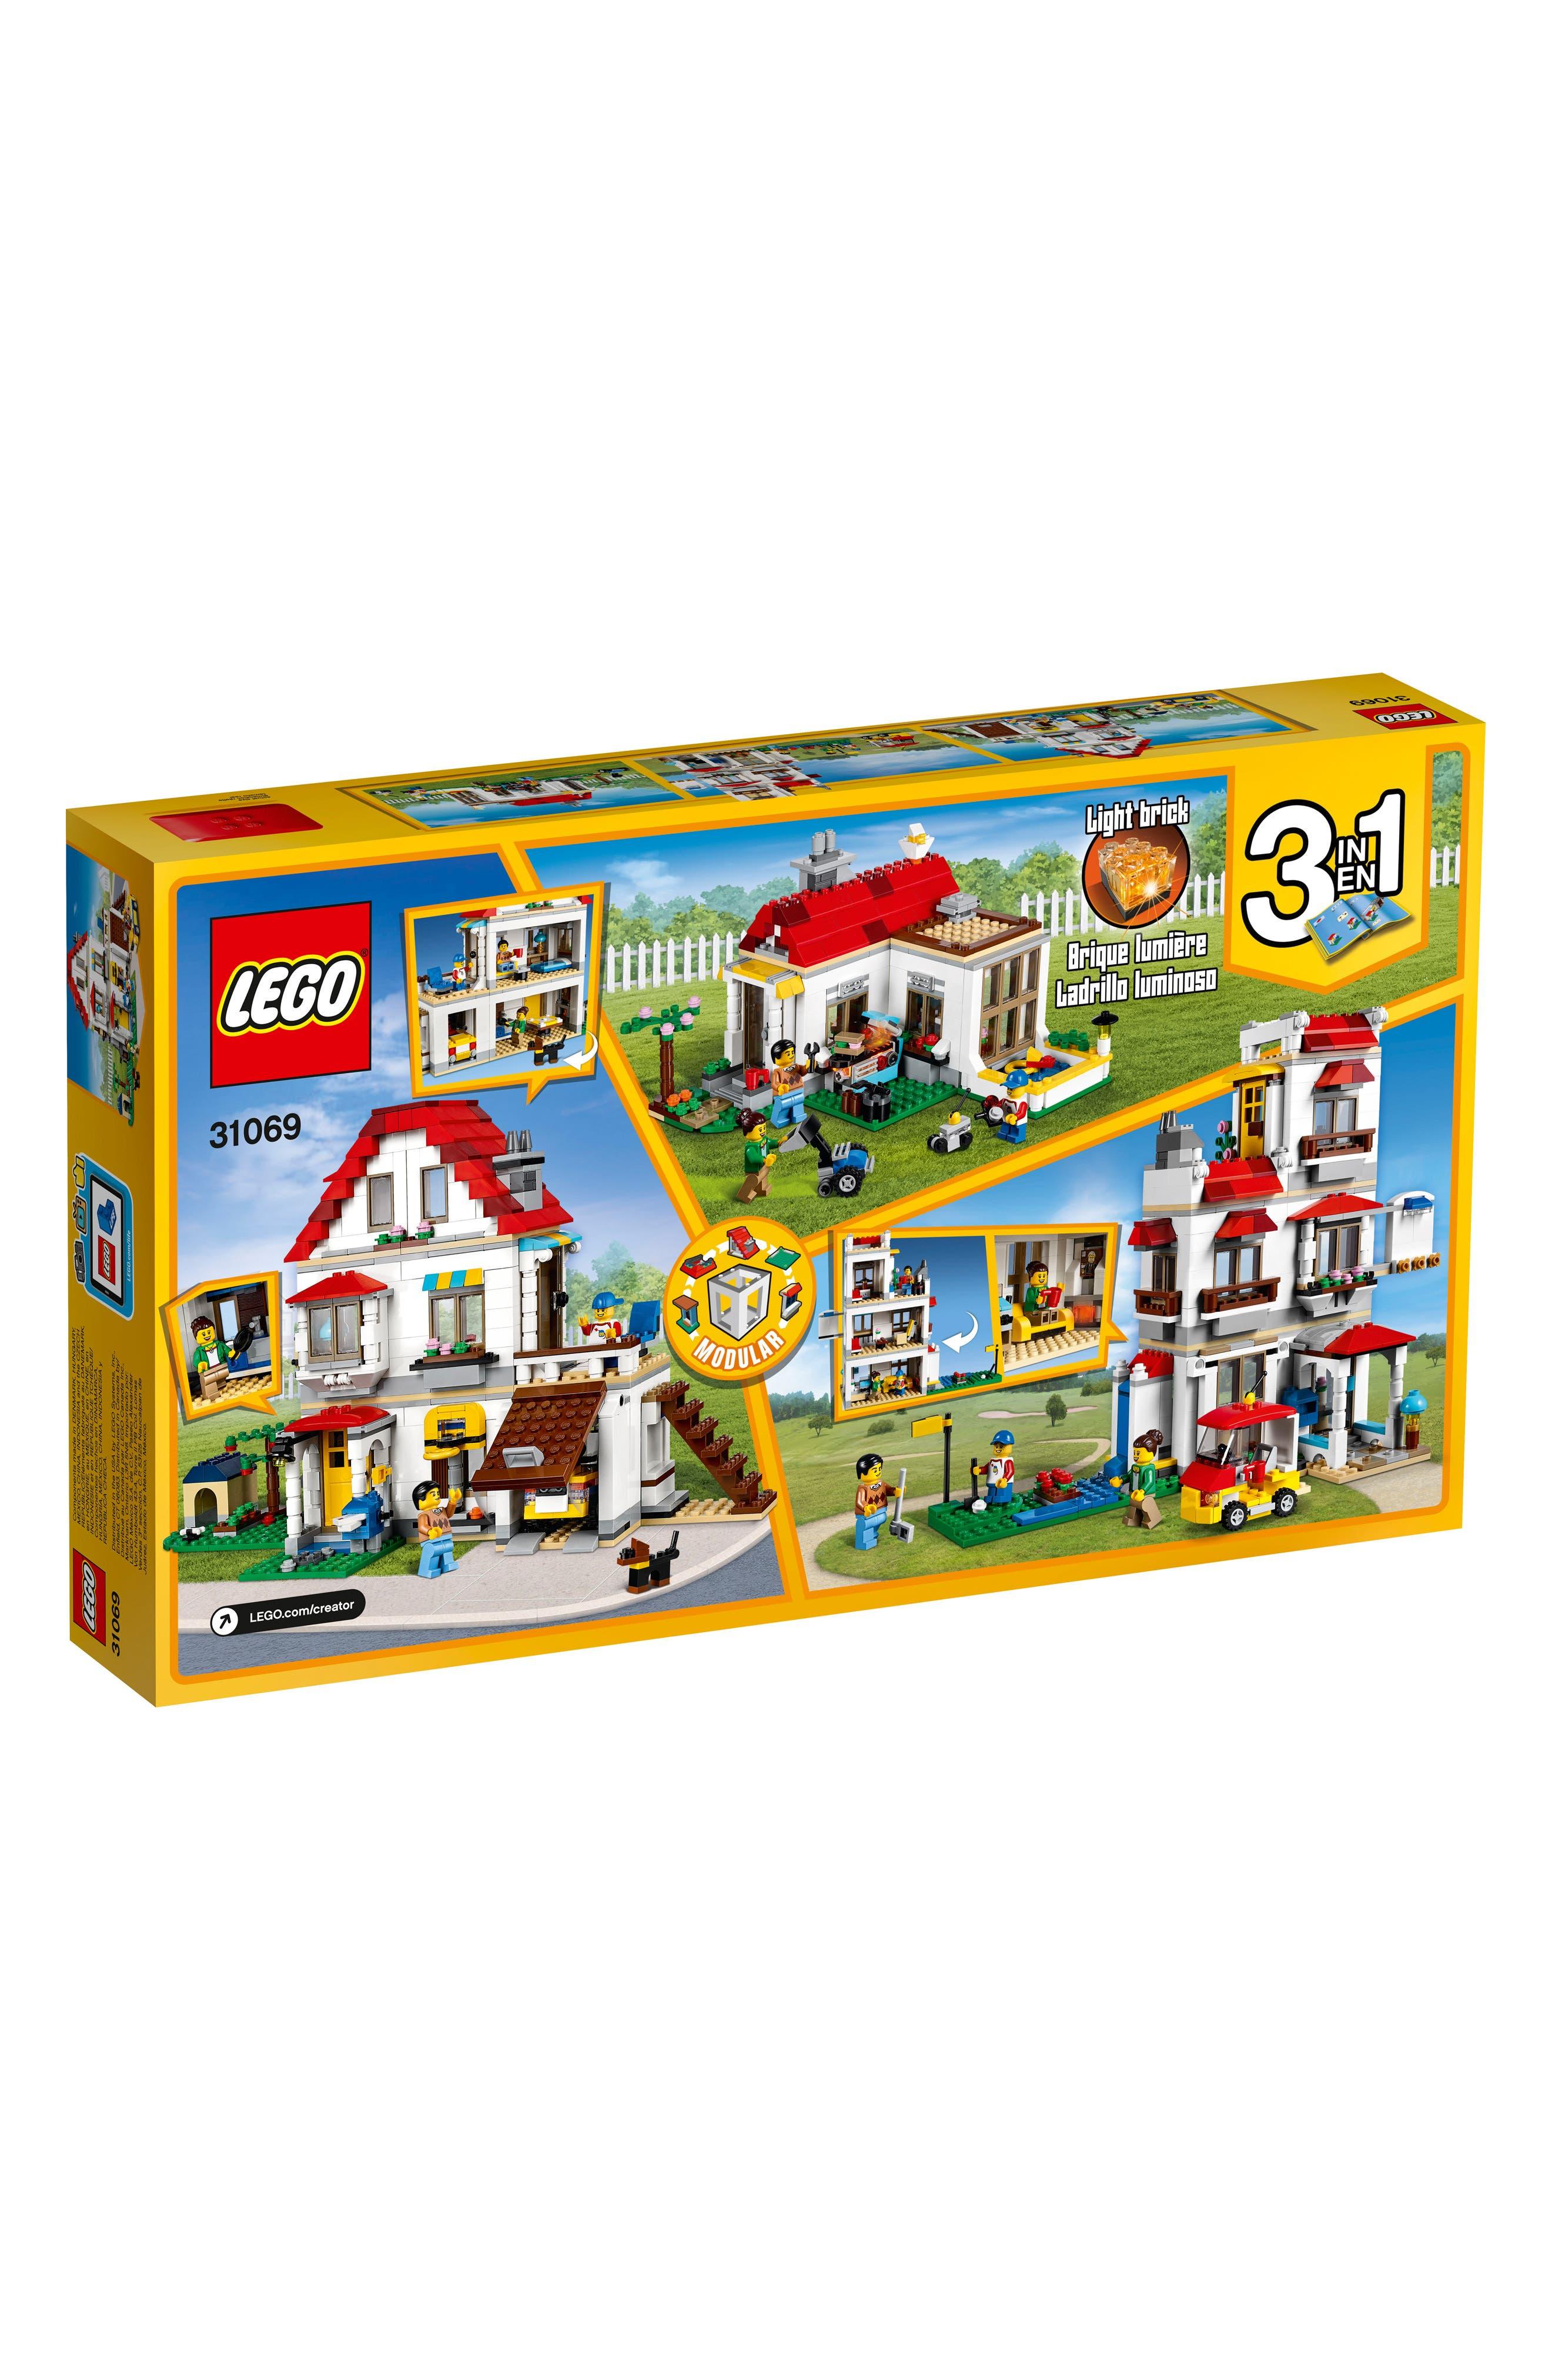 Creator Modular Family Villa Play Set - 31069,                         Main,                         color, 100